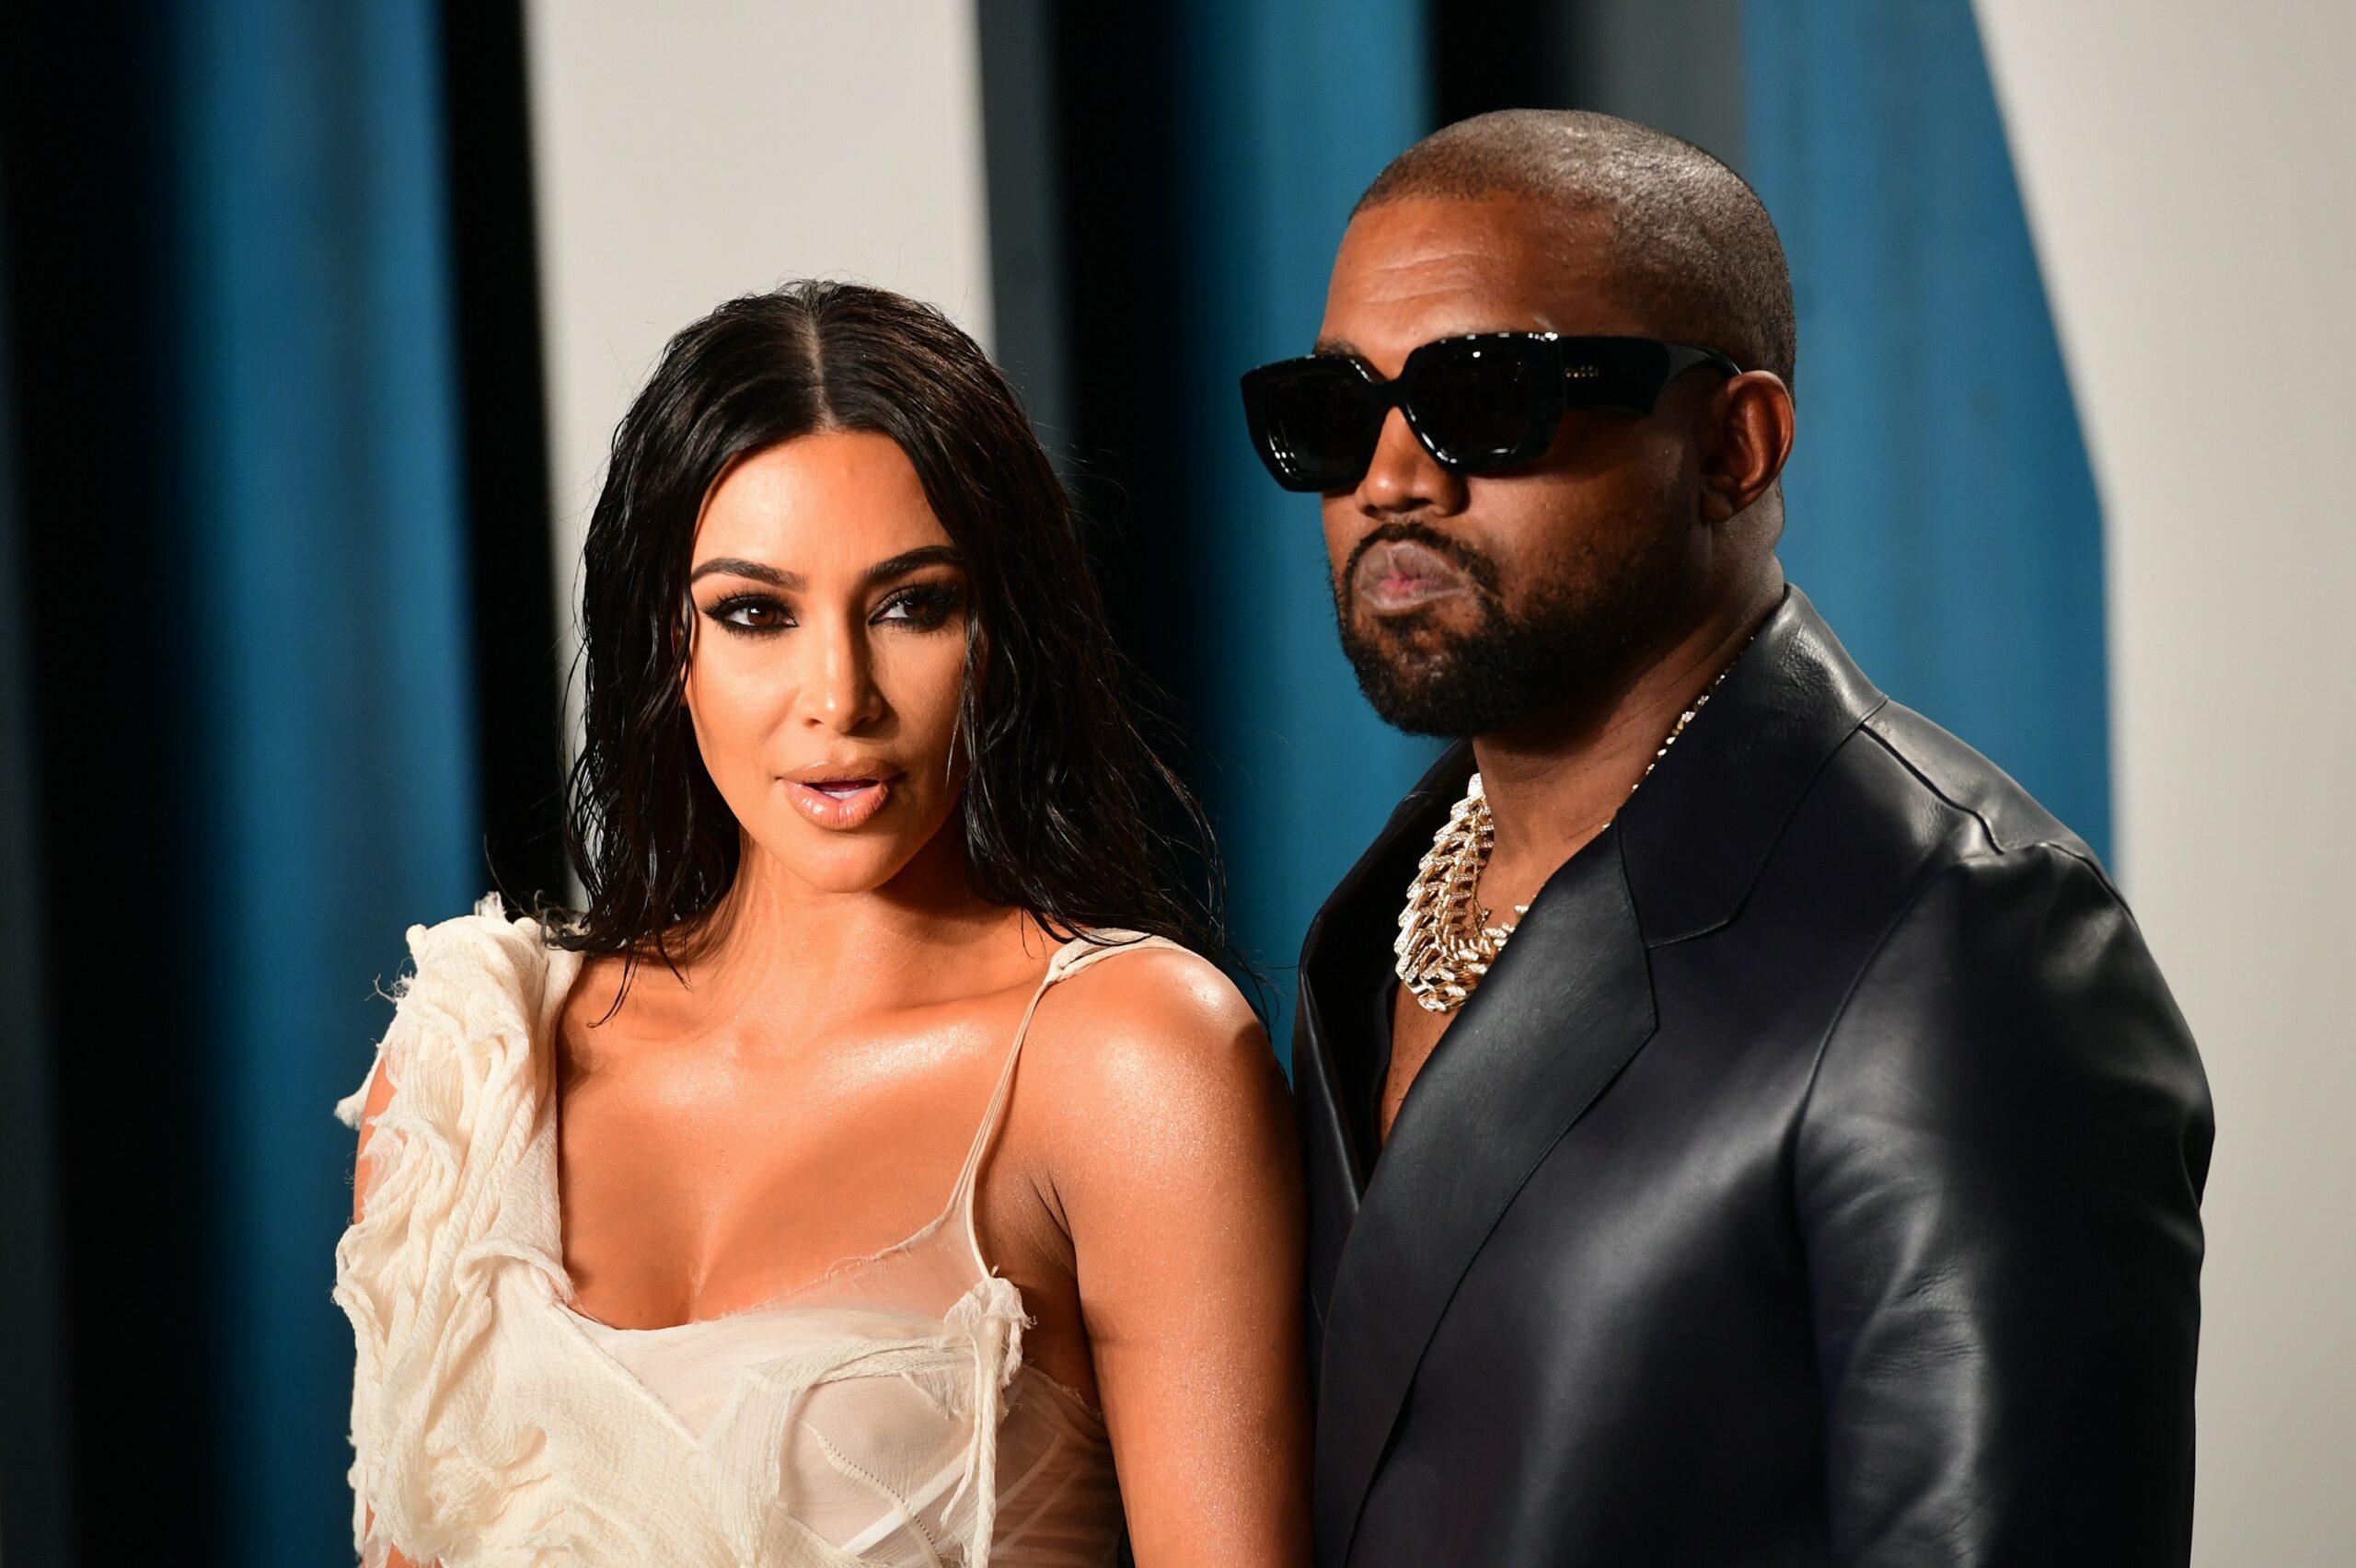 kanye west with kim kardashian talk about mental health